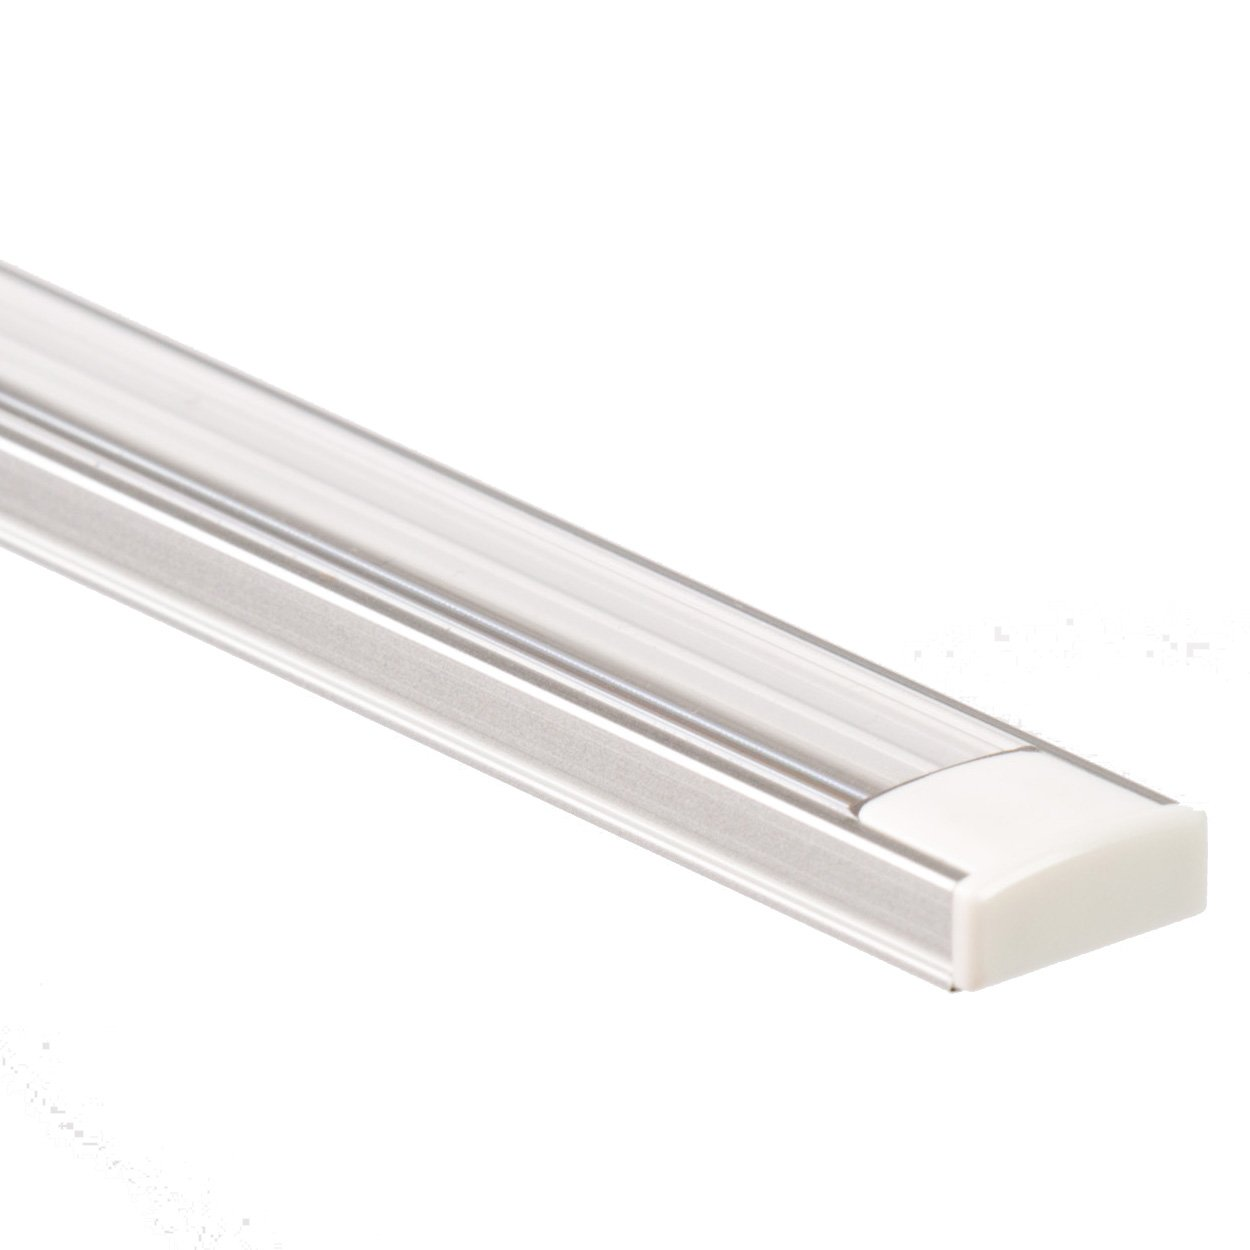 Abdeckung opal Aluprofil LED Streifen 2m PL 2 Aluminium Profil Arrakis f